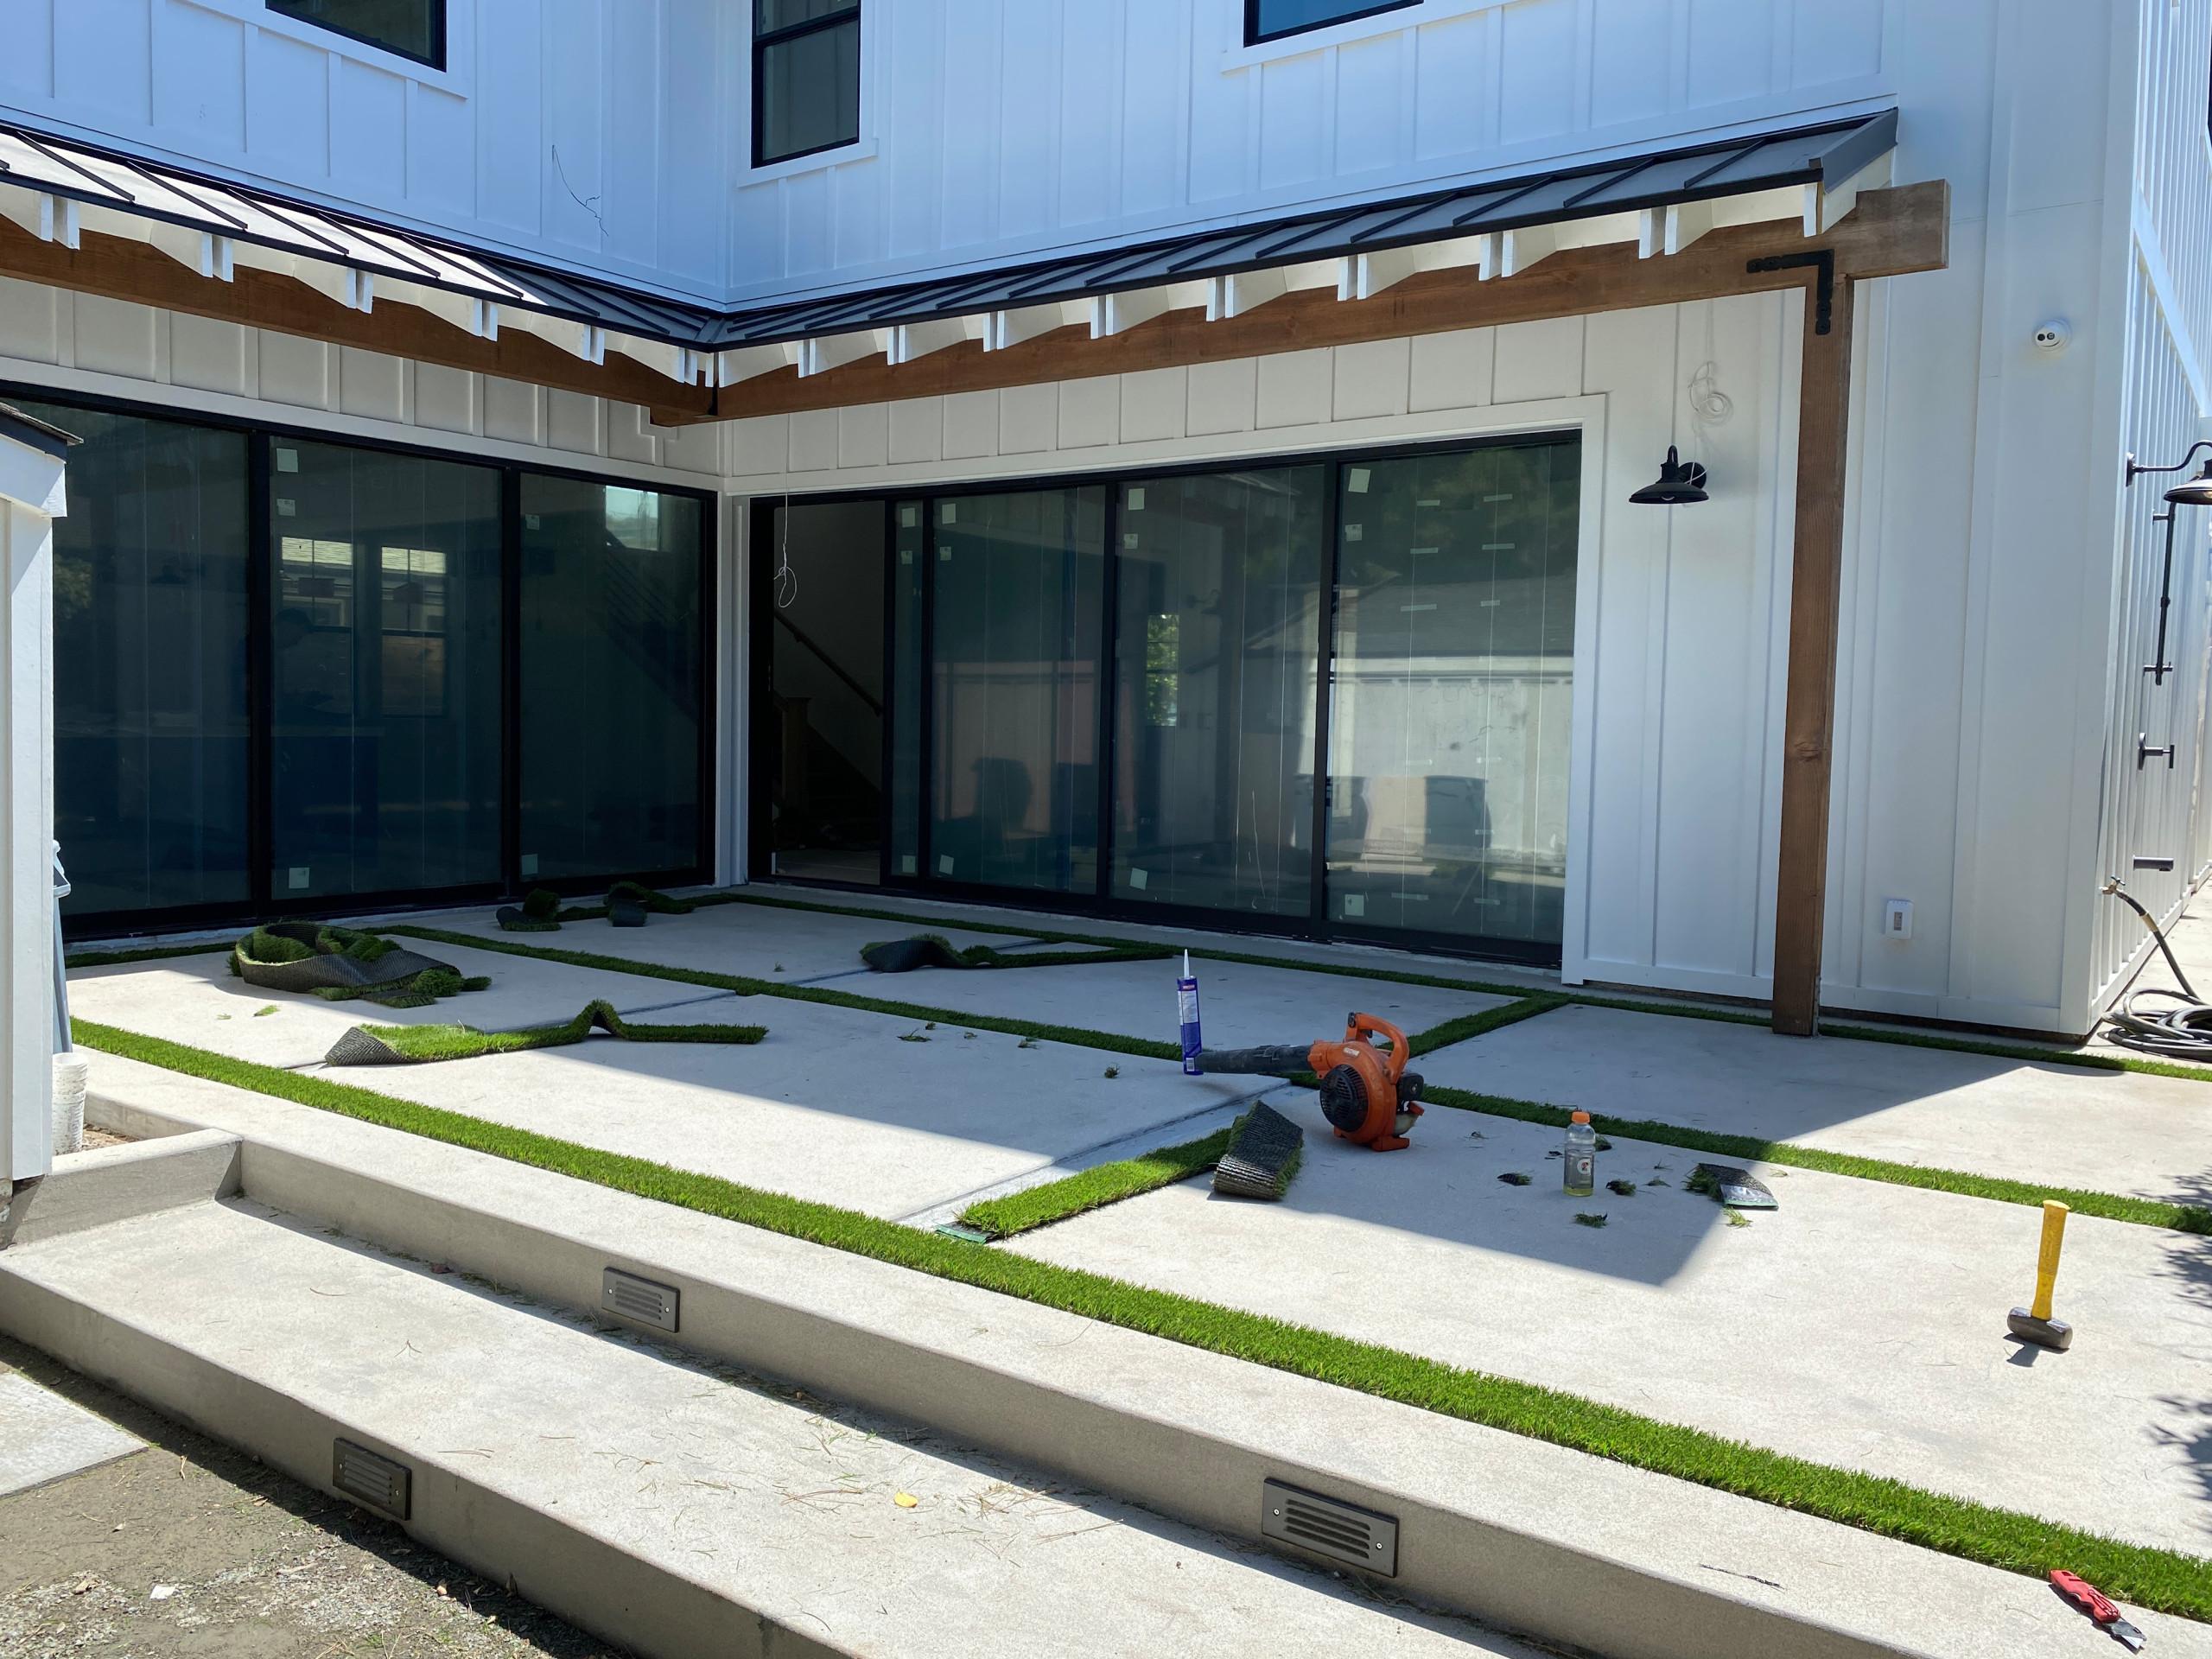 Installing Artificial Turf in Concrete Squares in La Jolla Shores